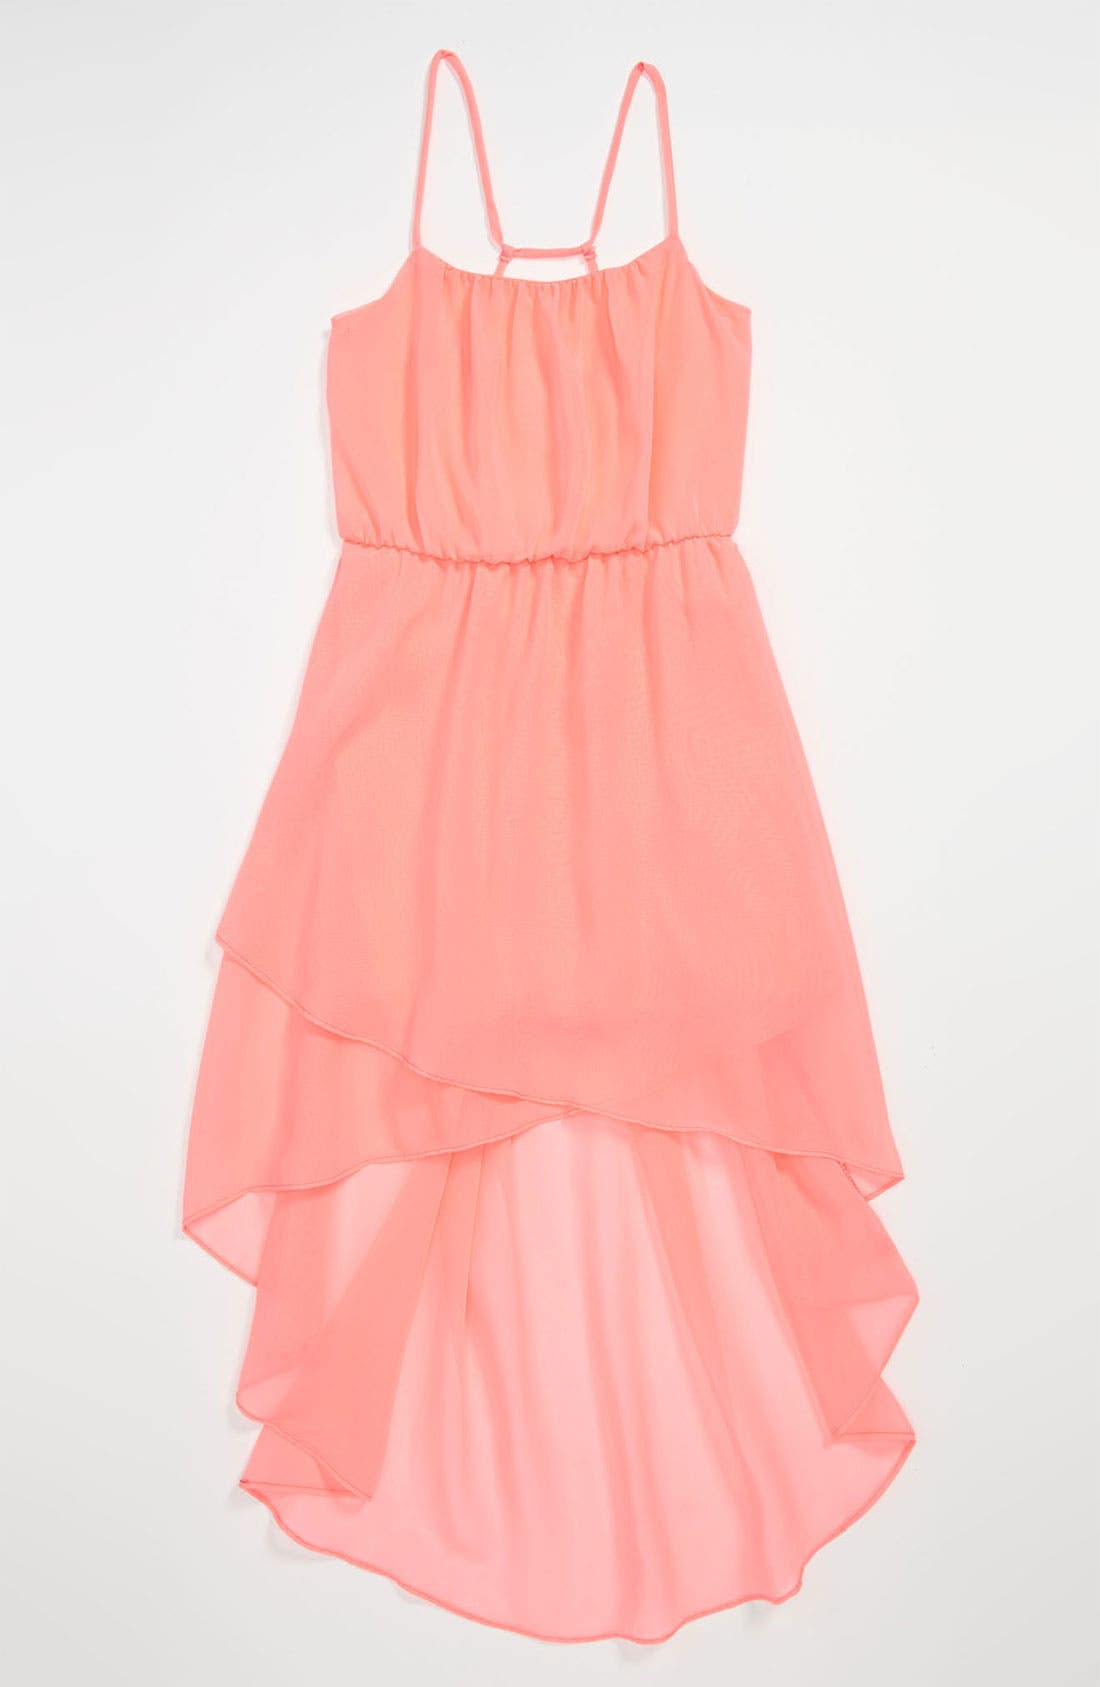 Alternate Image 1 Selected - Kiddo Spaghetti Strap High/Low Dress (Big Girls)